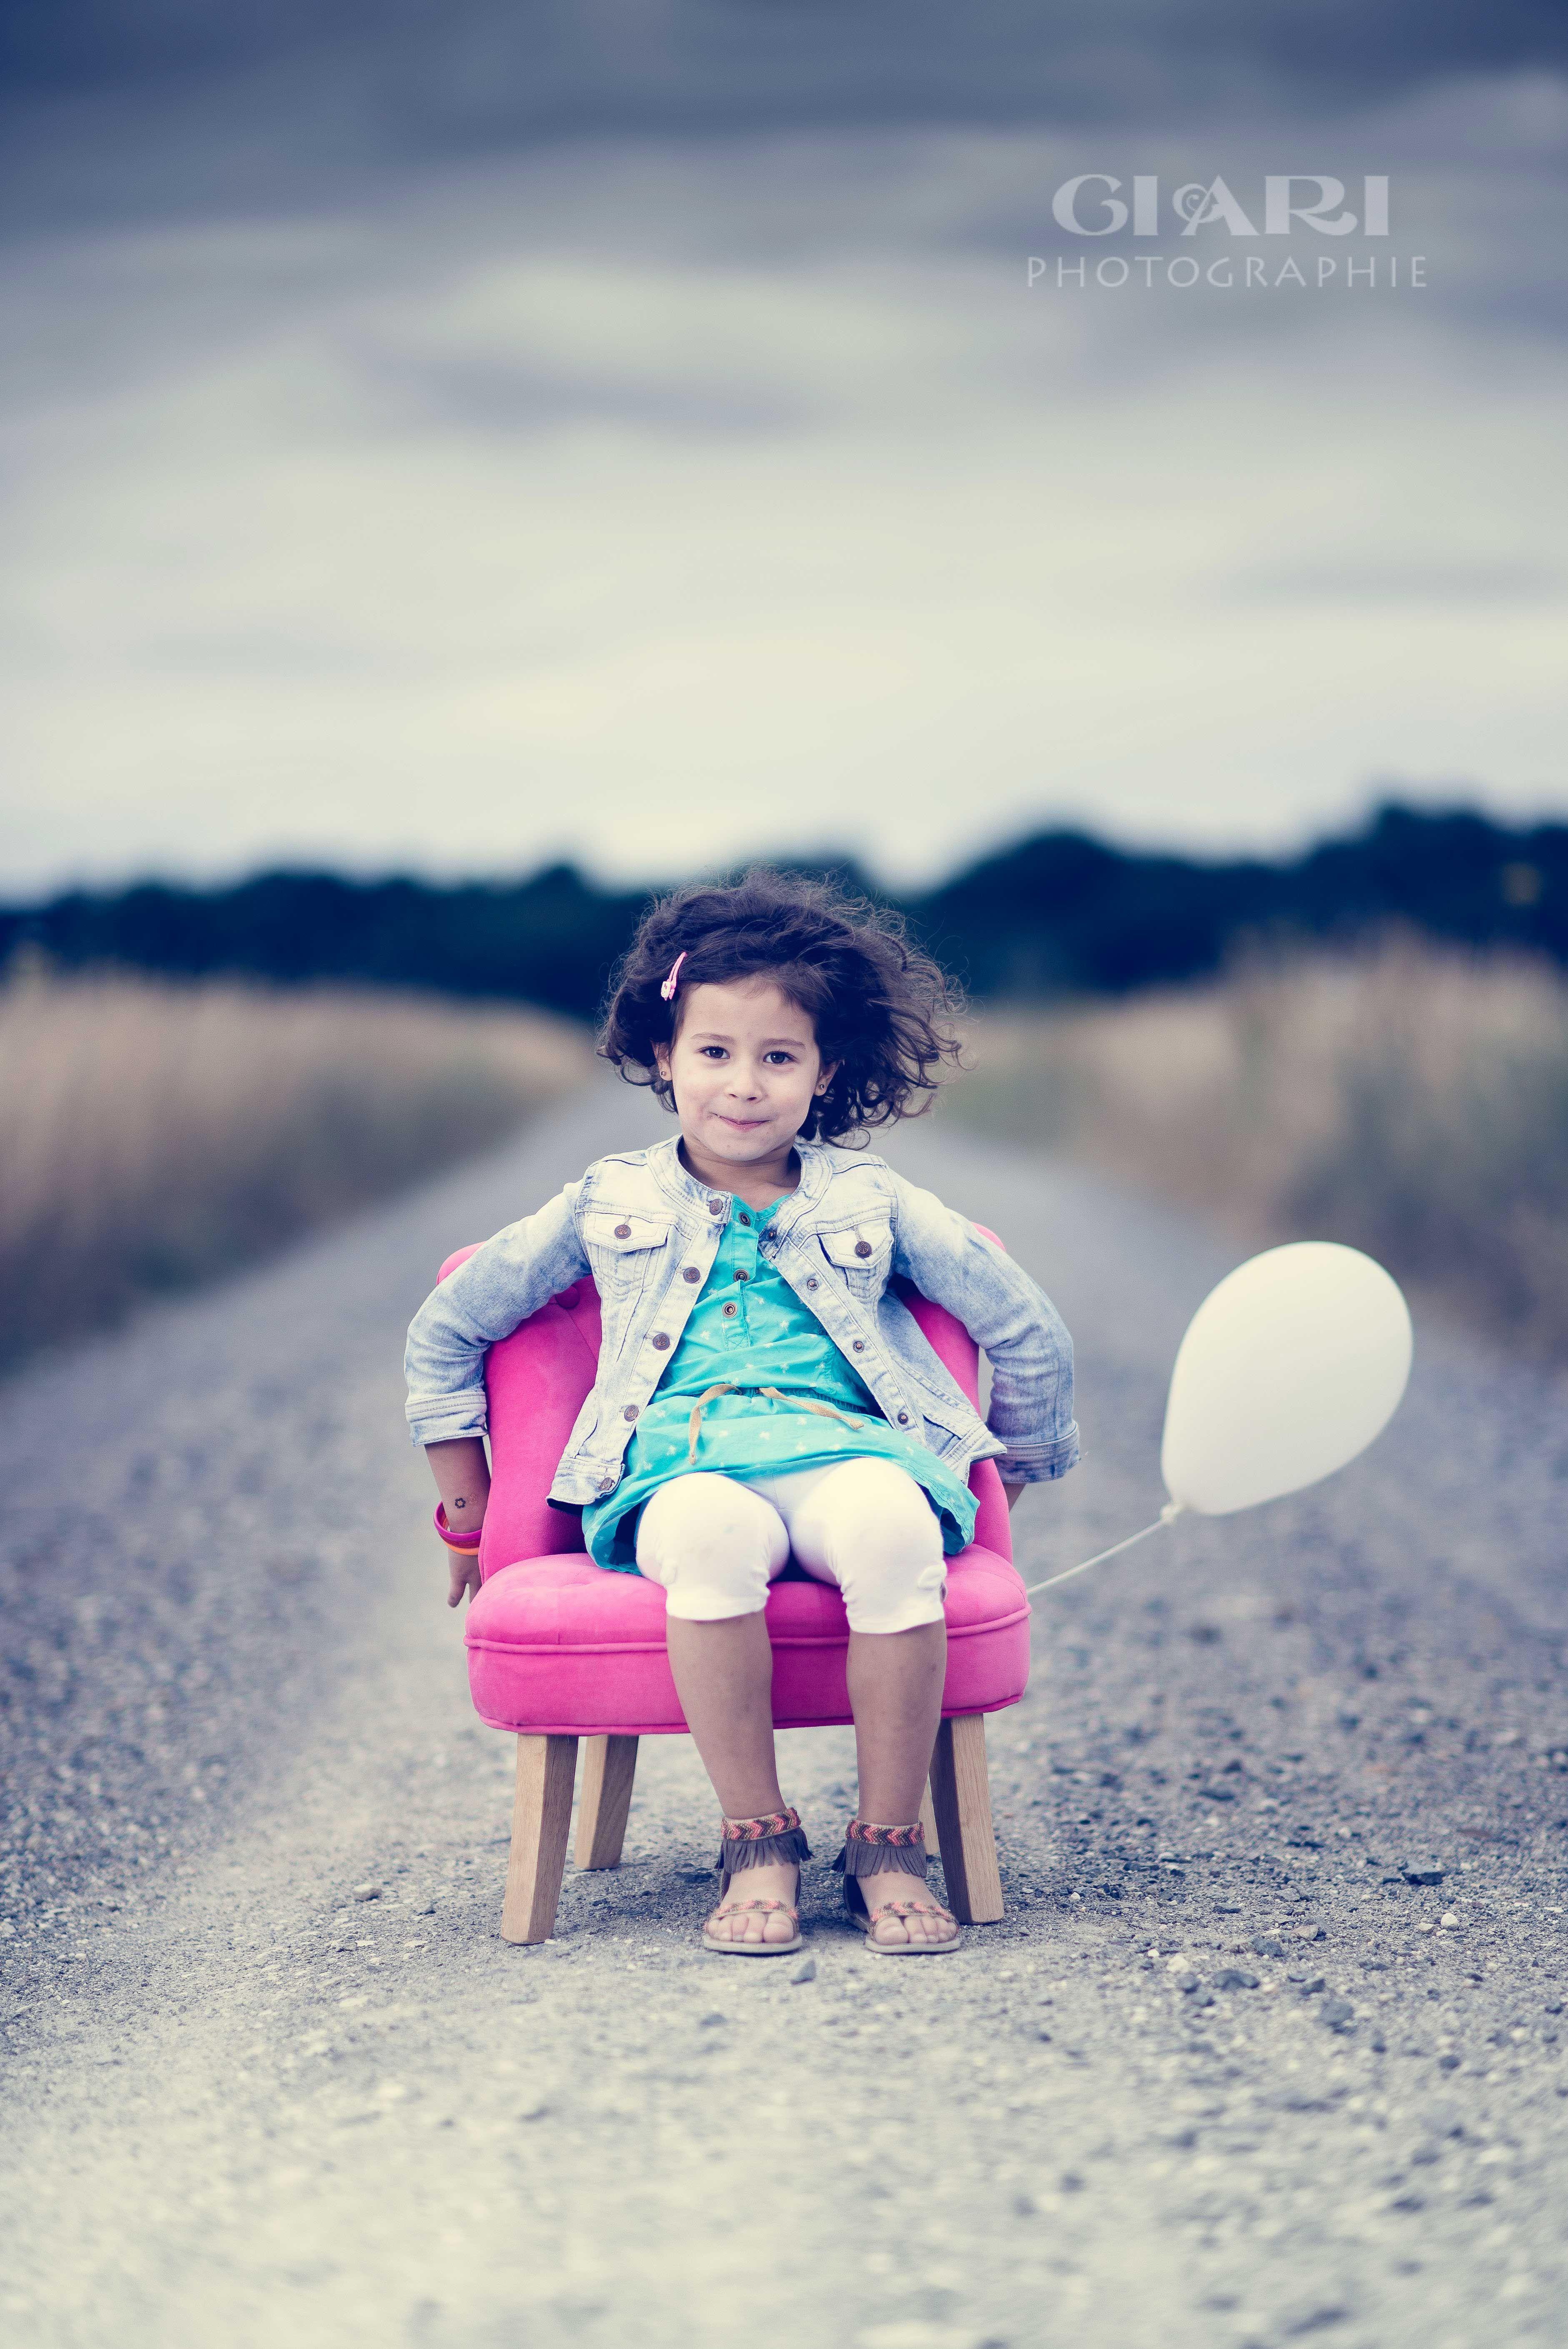 LITTLE GIRL IN A CHAIR CIARI PHOTOGRAPHIE Pinterest